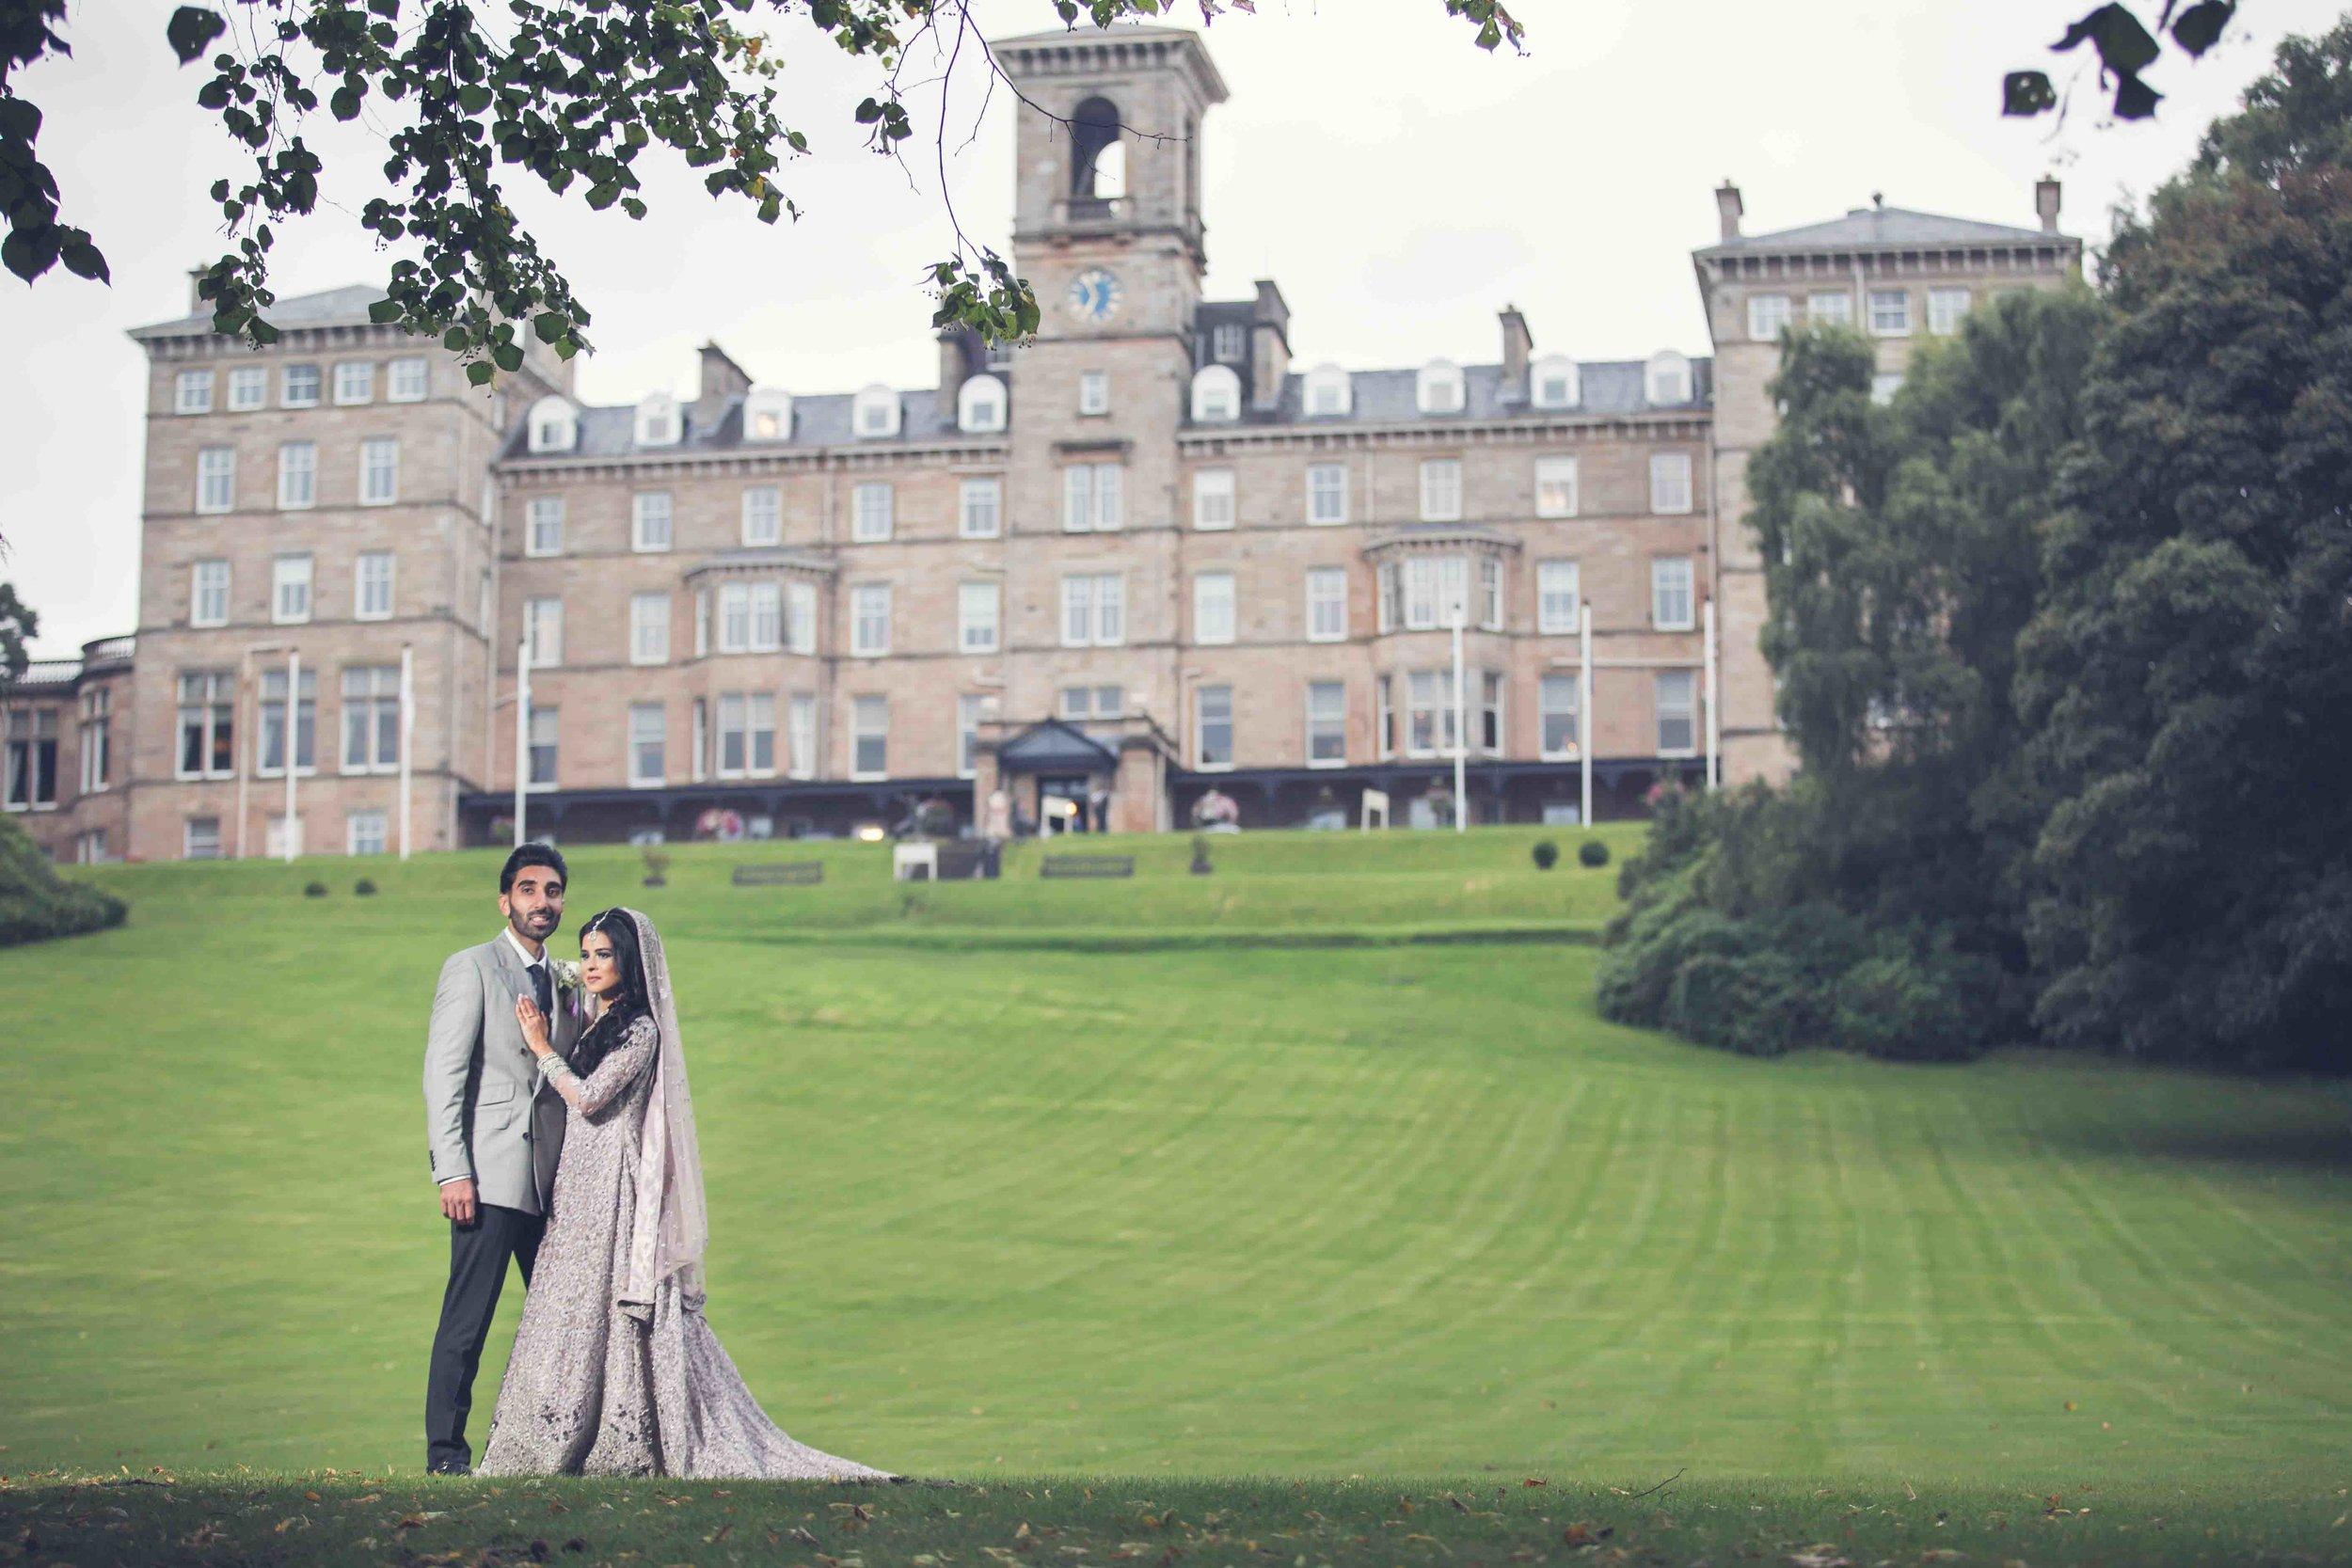 weddings - view portraits